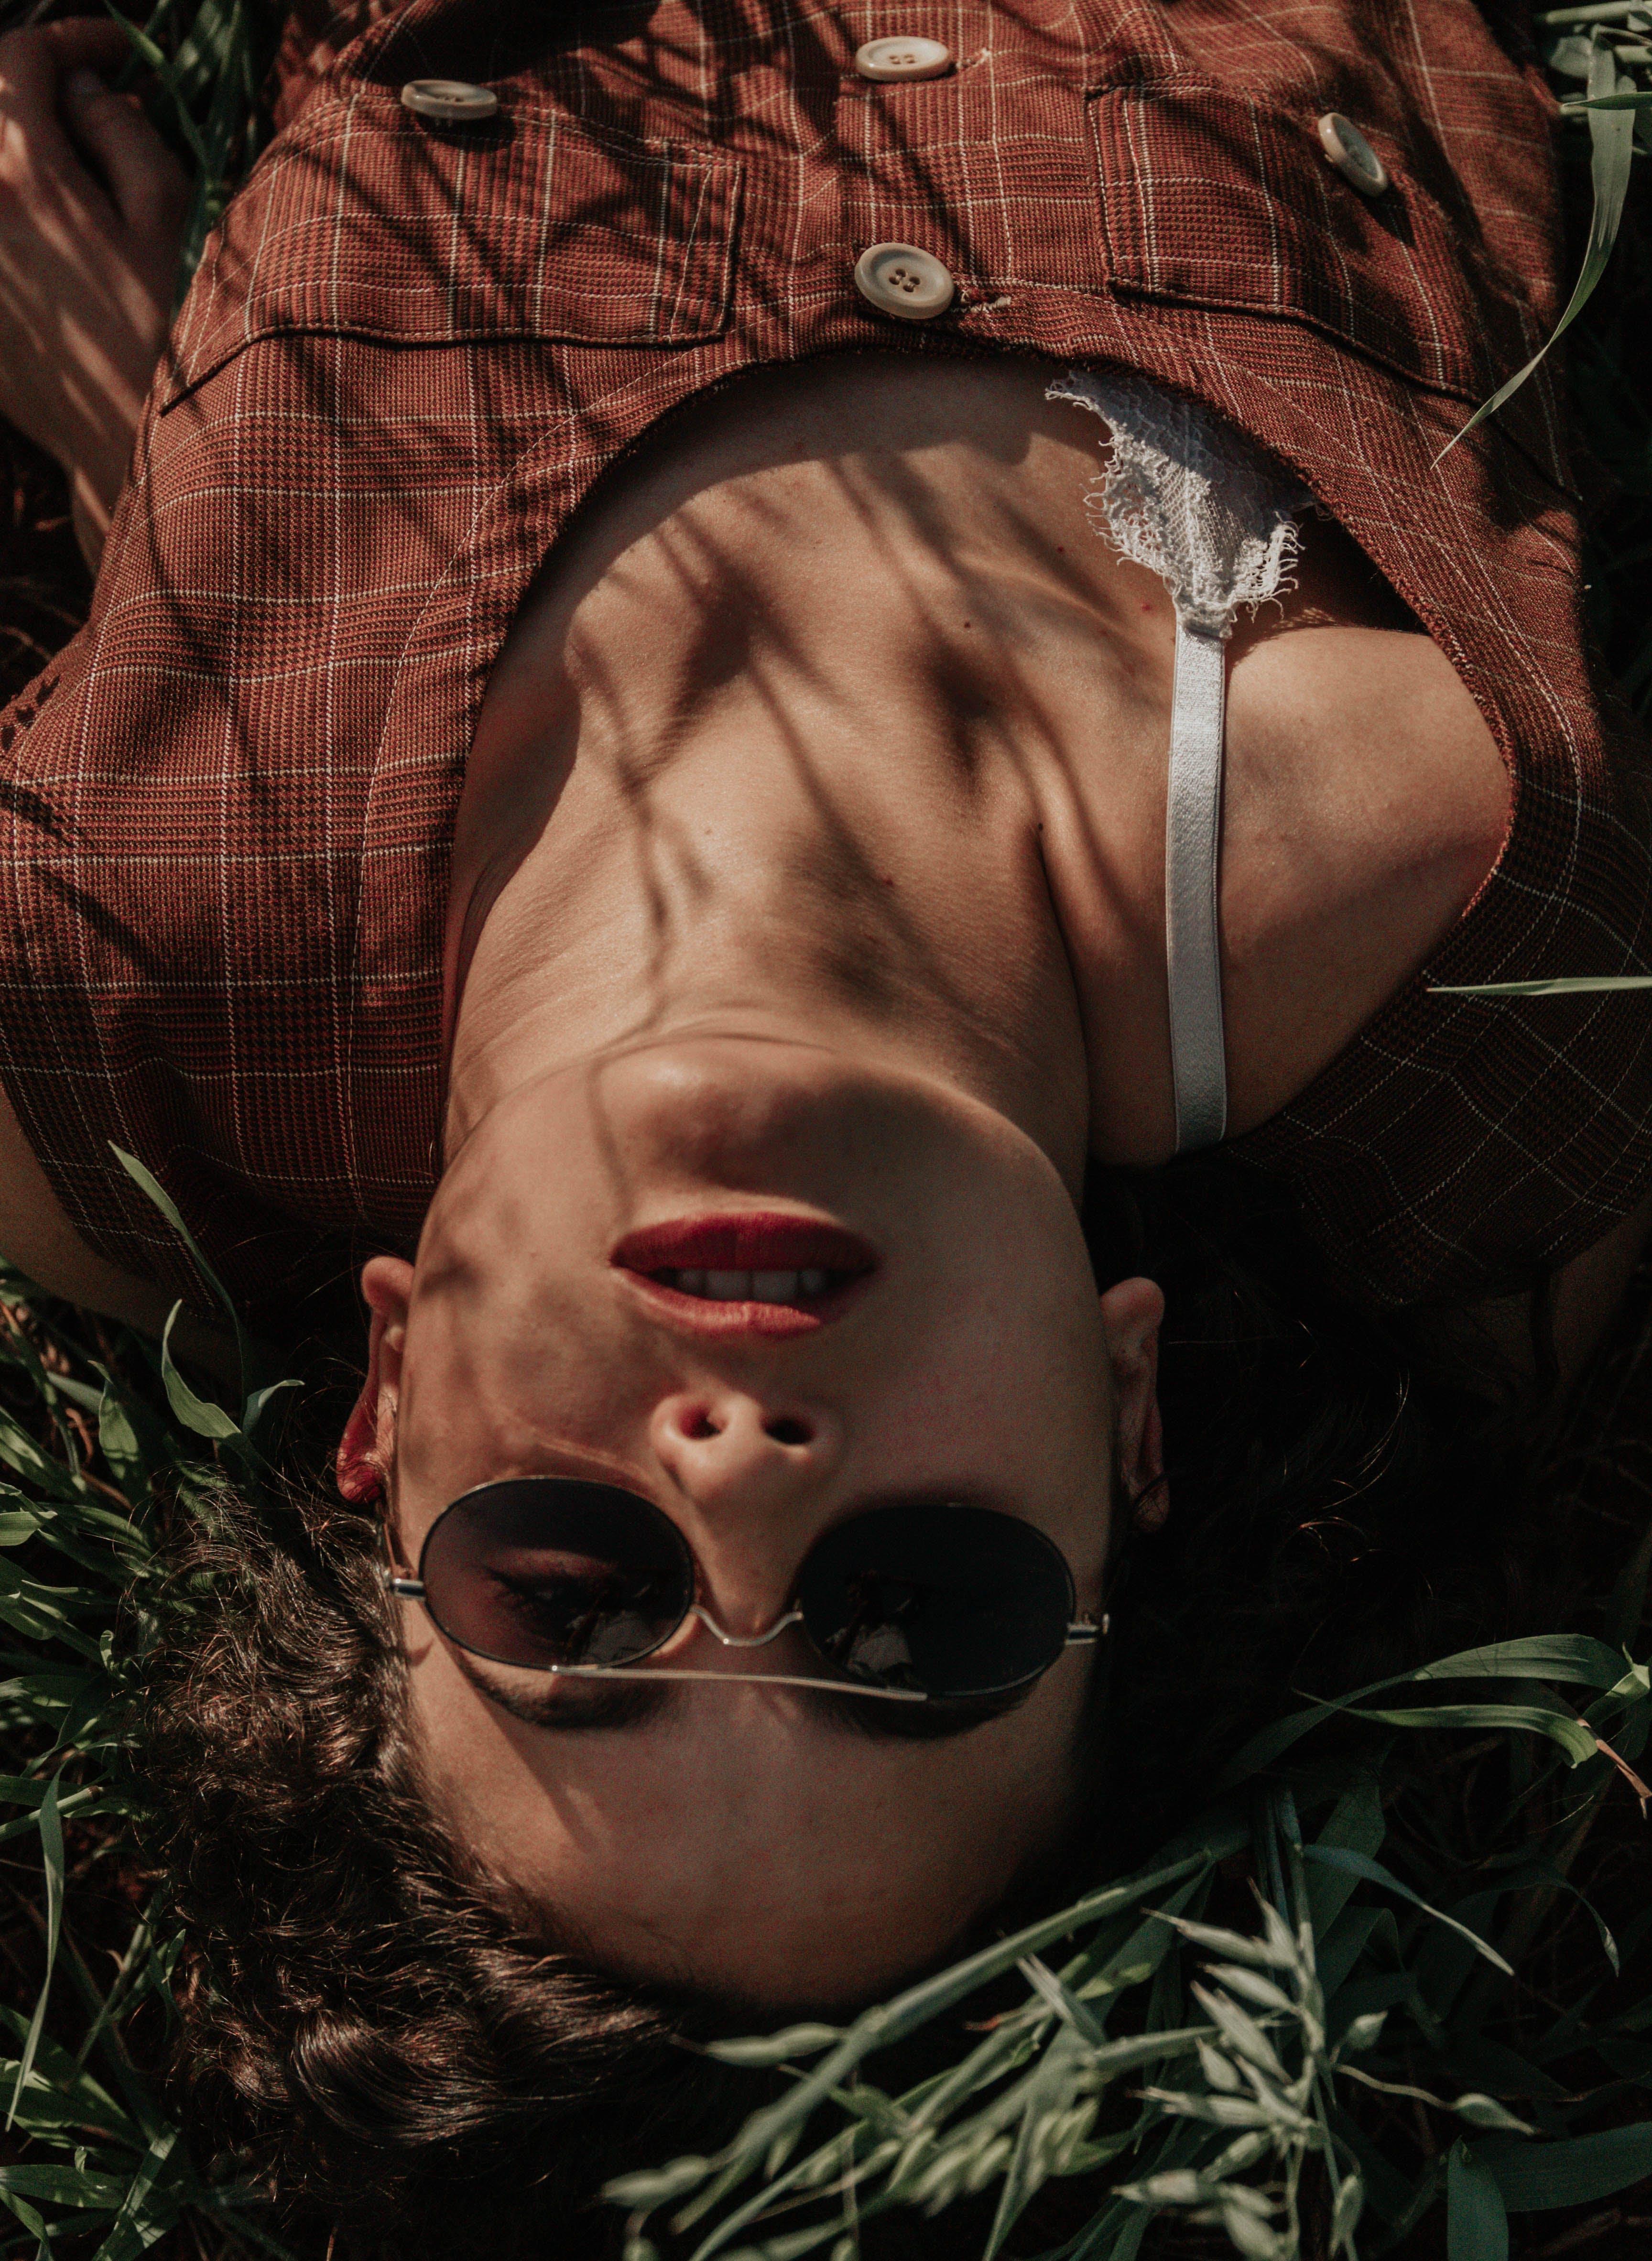 Woman Wearing Sunglasses Lying on Ground